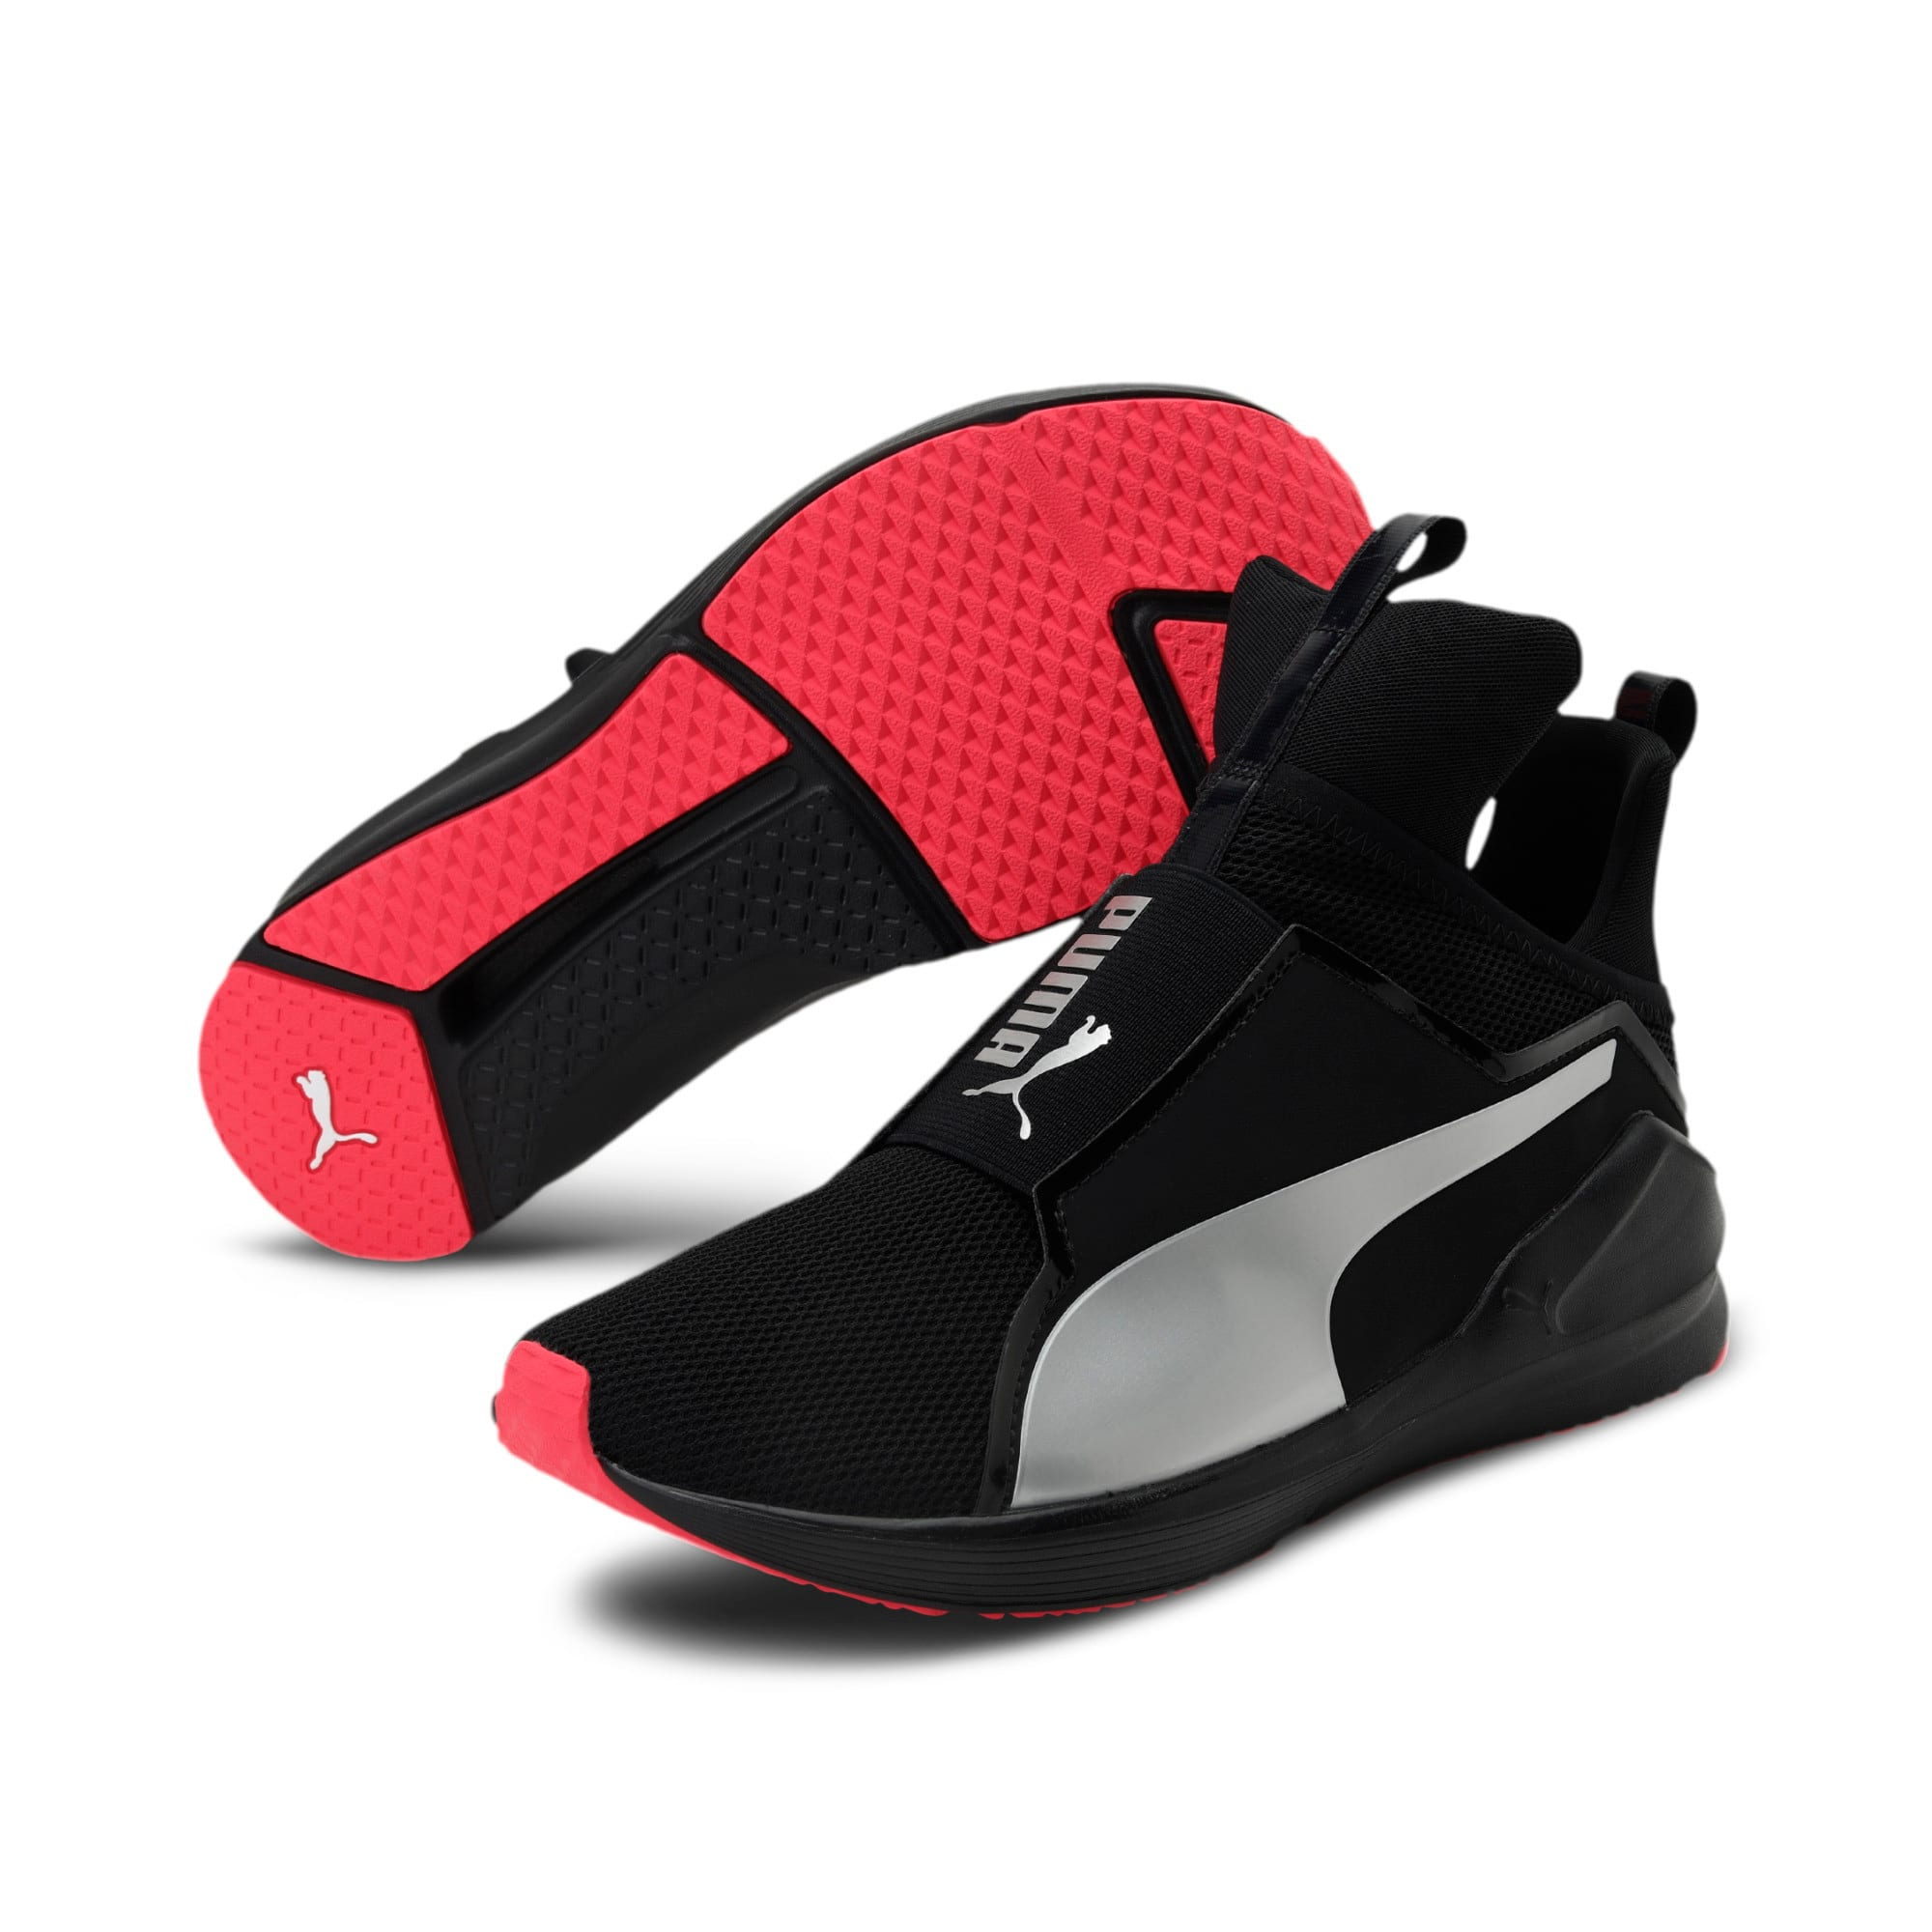 Thumbnail 2 of PUMA Fierce Core Training Shoes, Puma Black-Paradise Pink, medium-IND